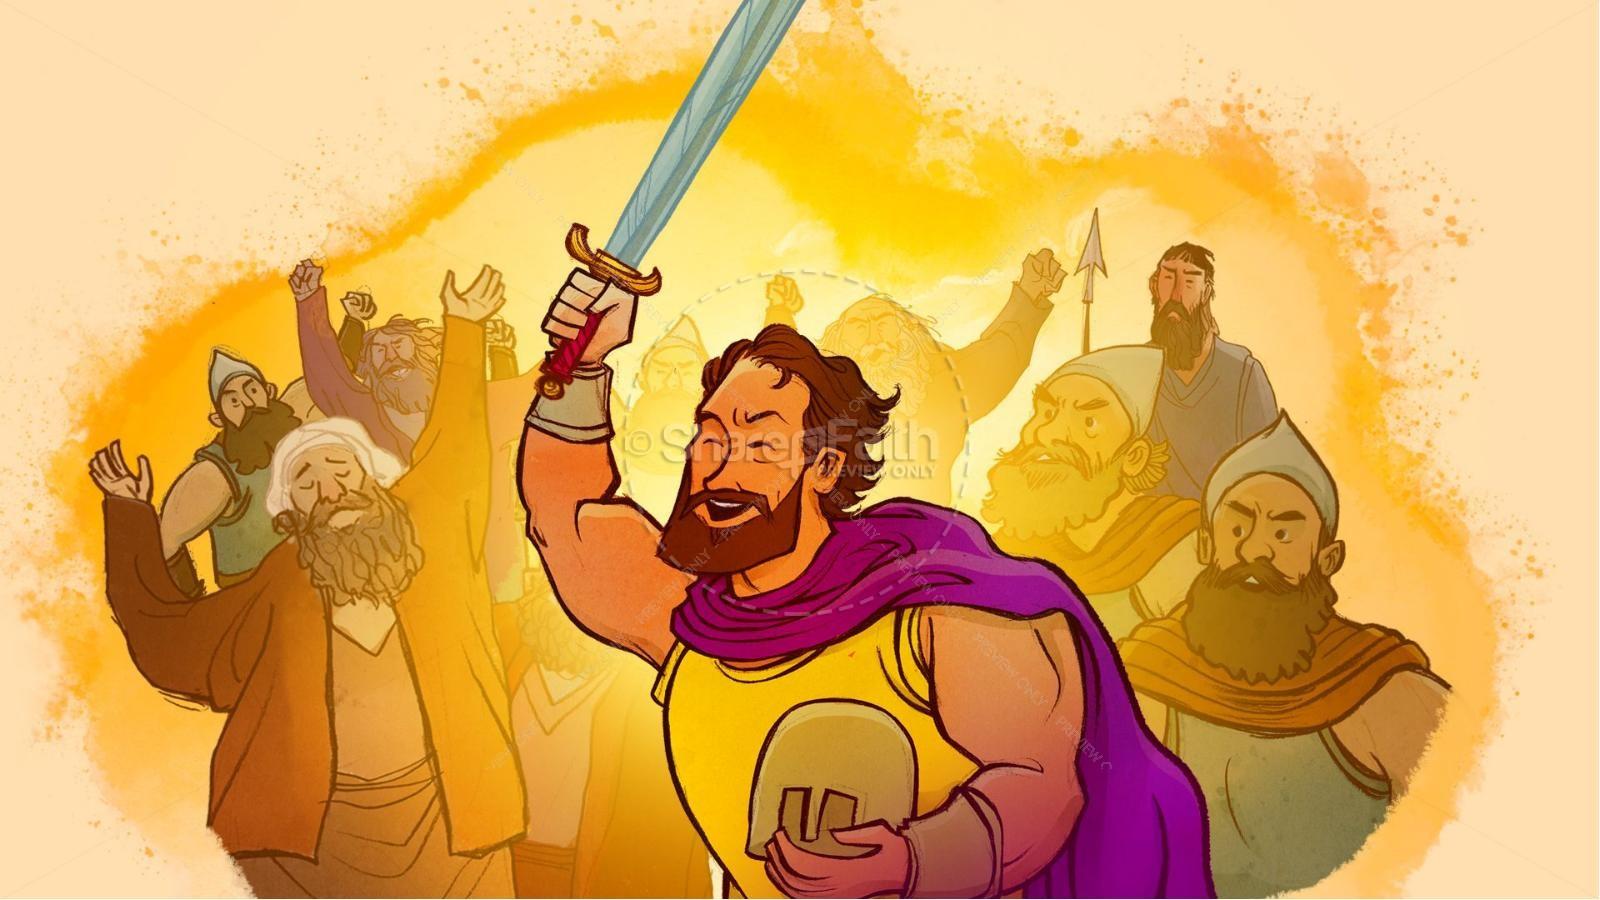 King Saul Kids Bible Story